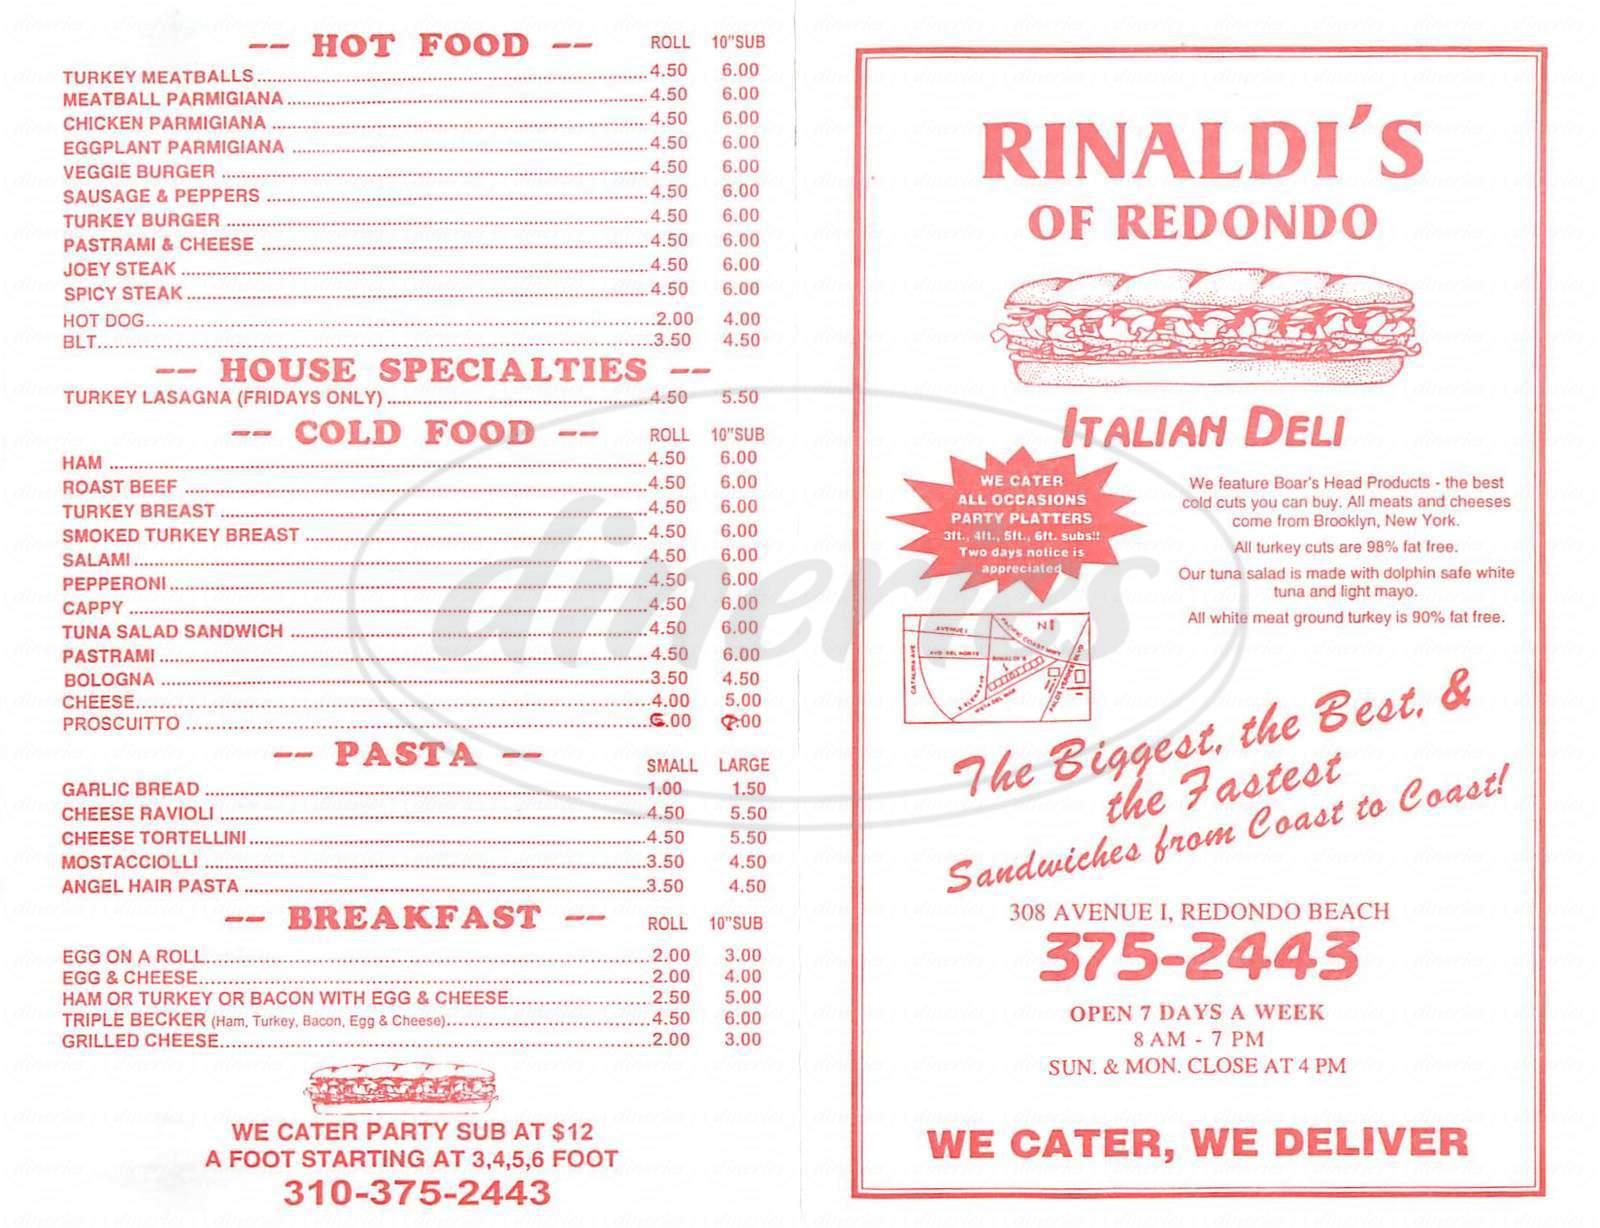 menu for Rinaldi's